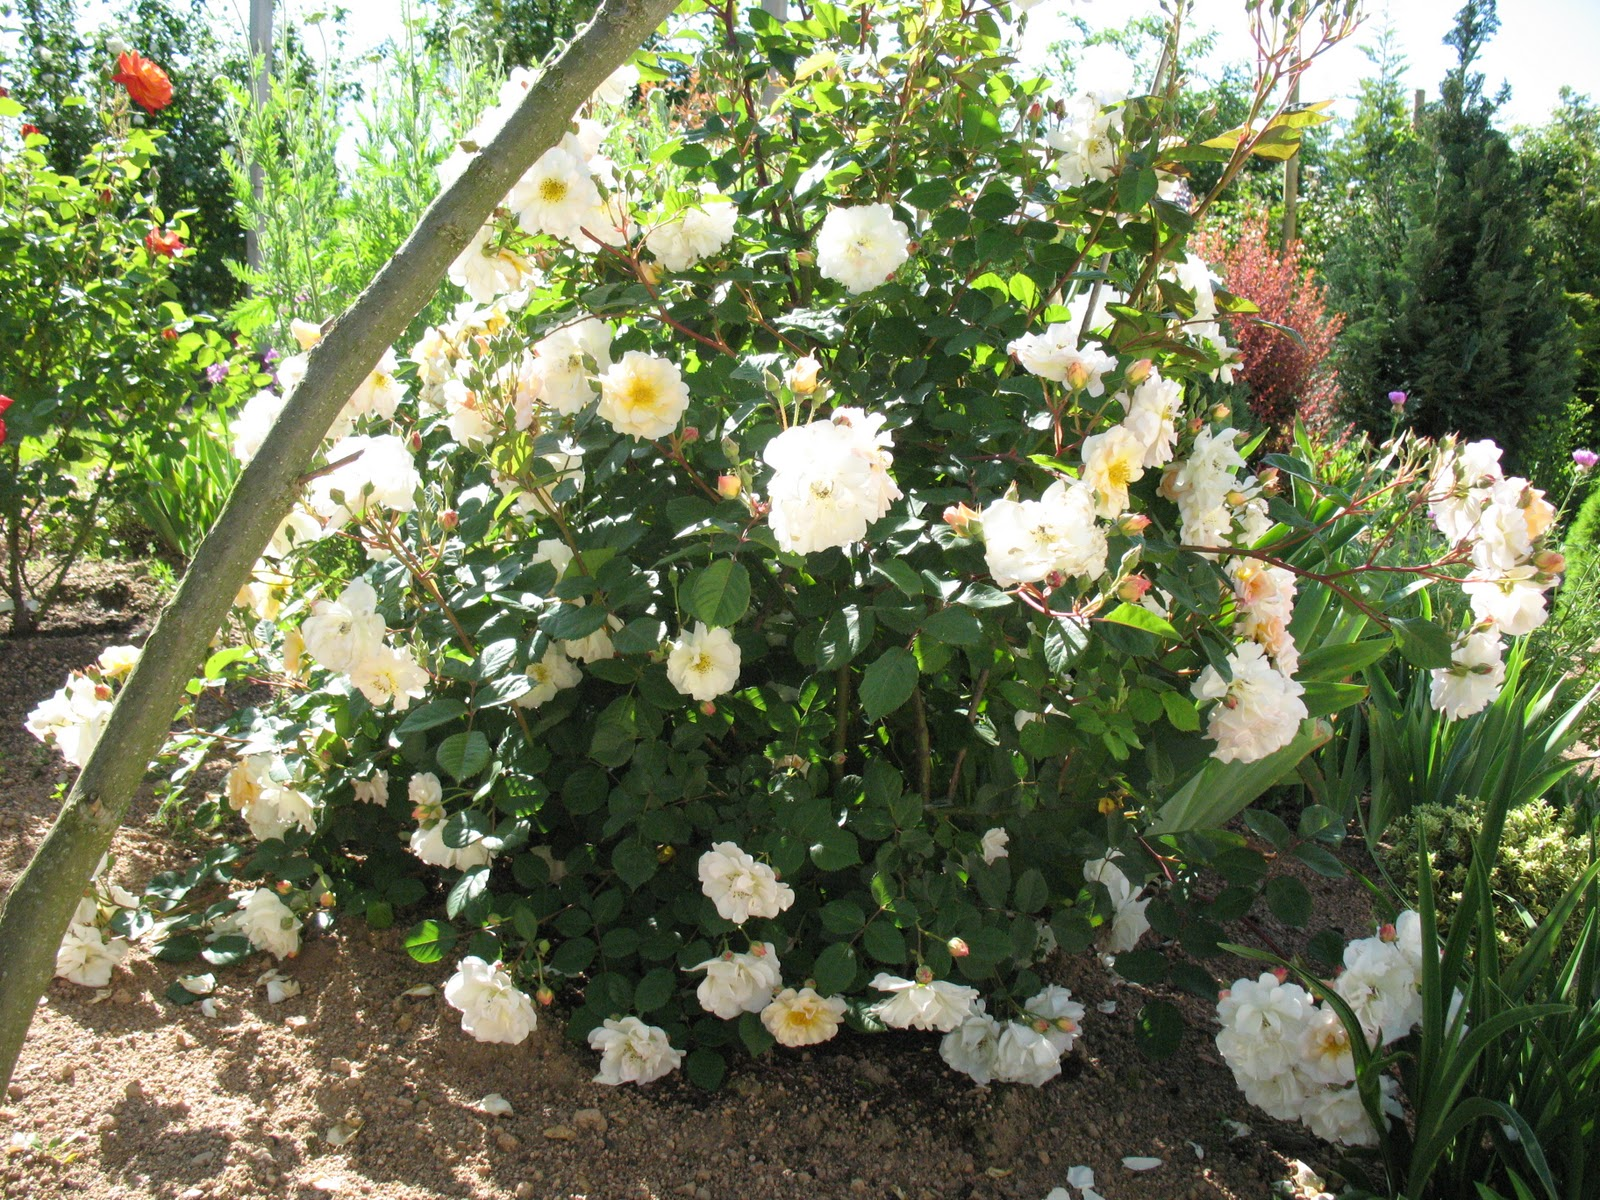 Roses du jardin ch neland rosier p n lope - Bouturer un rosier ancien ...